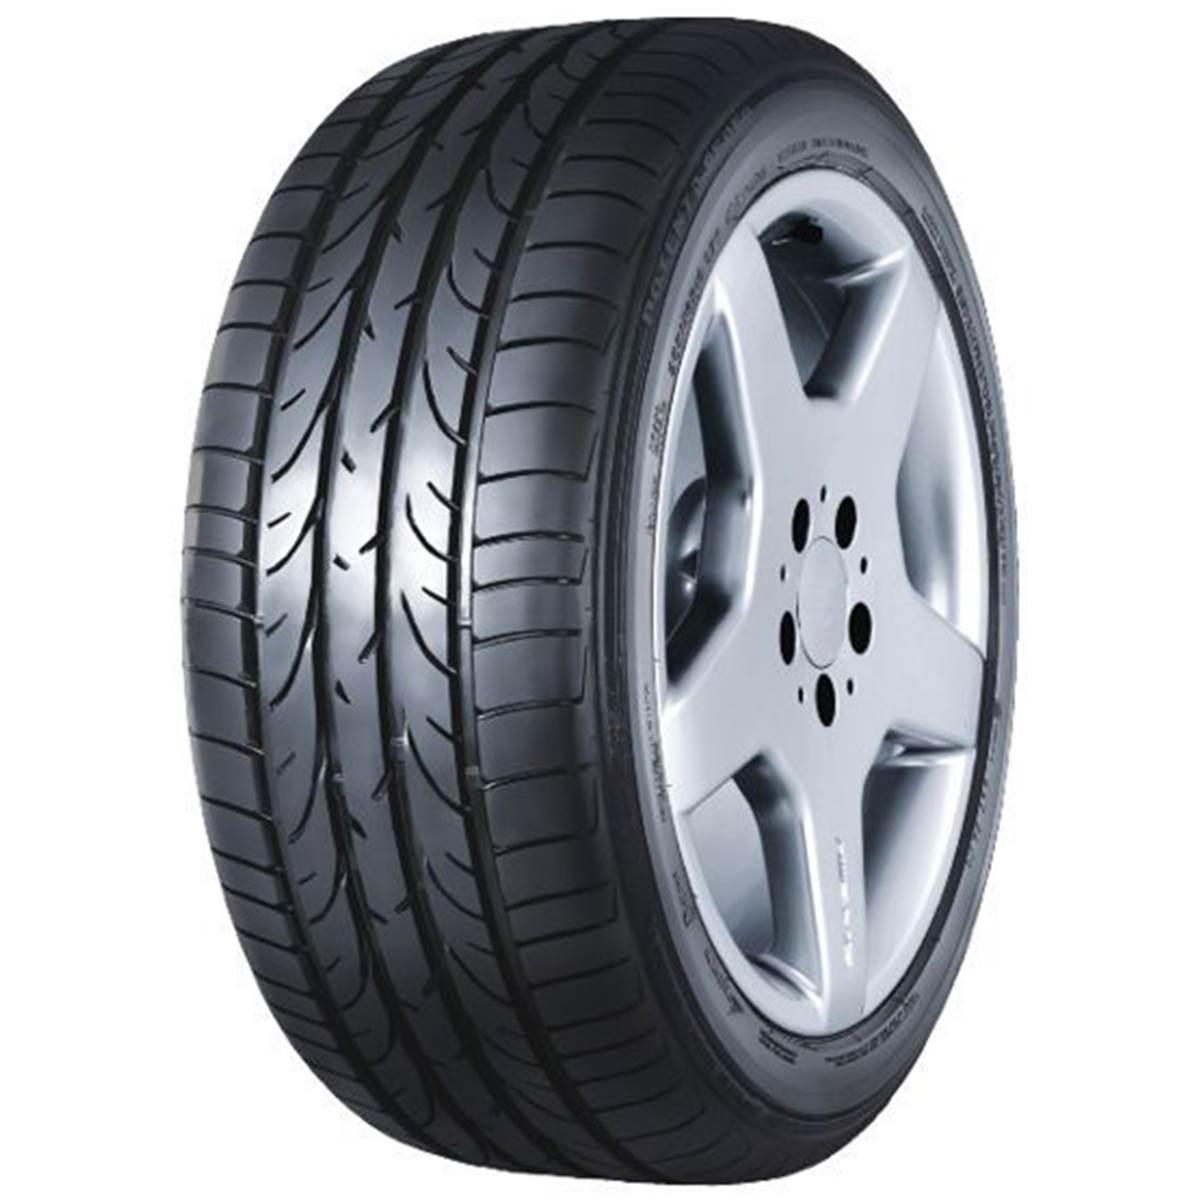 Pneu Bridgestone 215/45R17 87V Potenza Re050